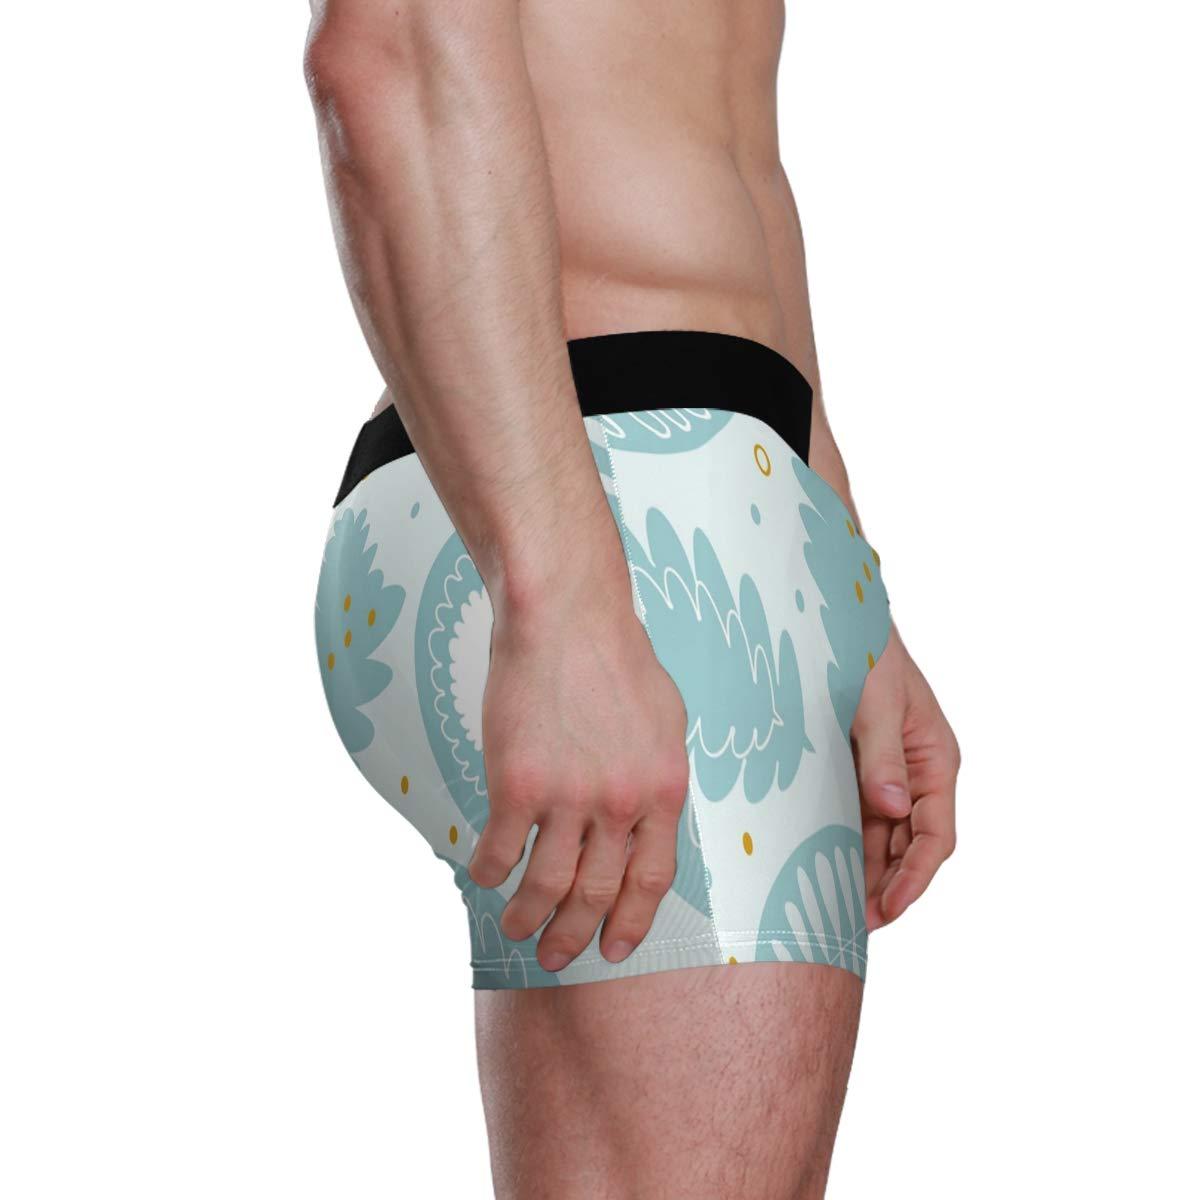 Winter Leawes Vipsk Seamless Stretch Mens Polyester Boxer Briefs Underwear 1-Pack Set